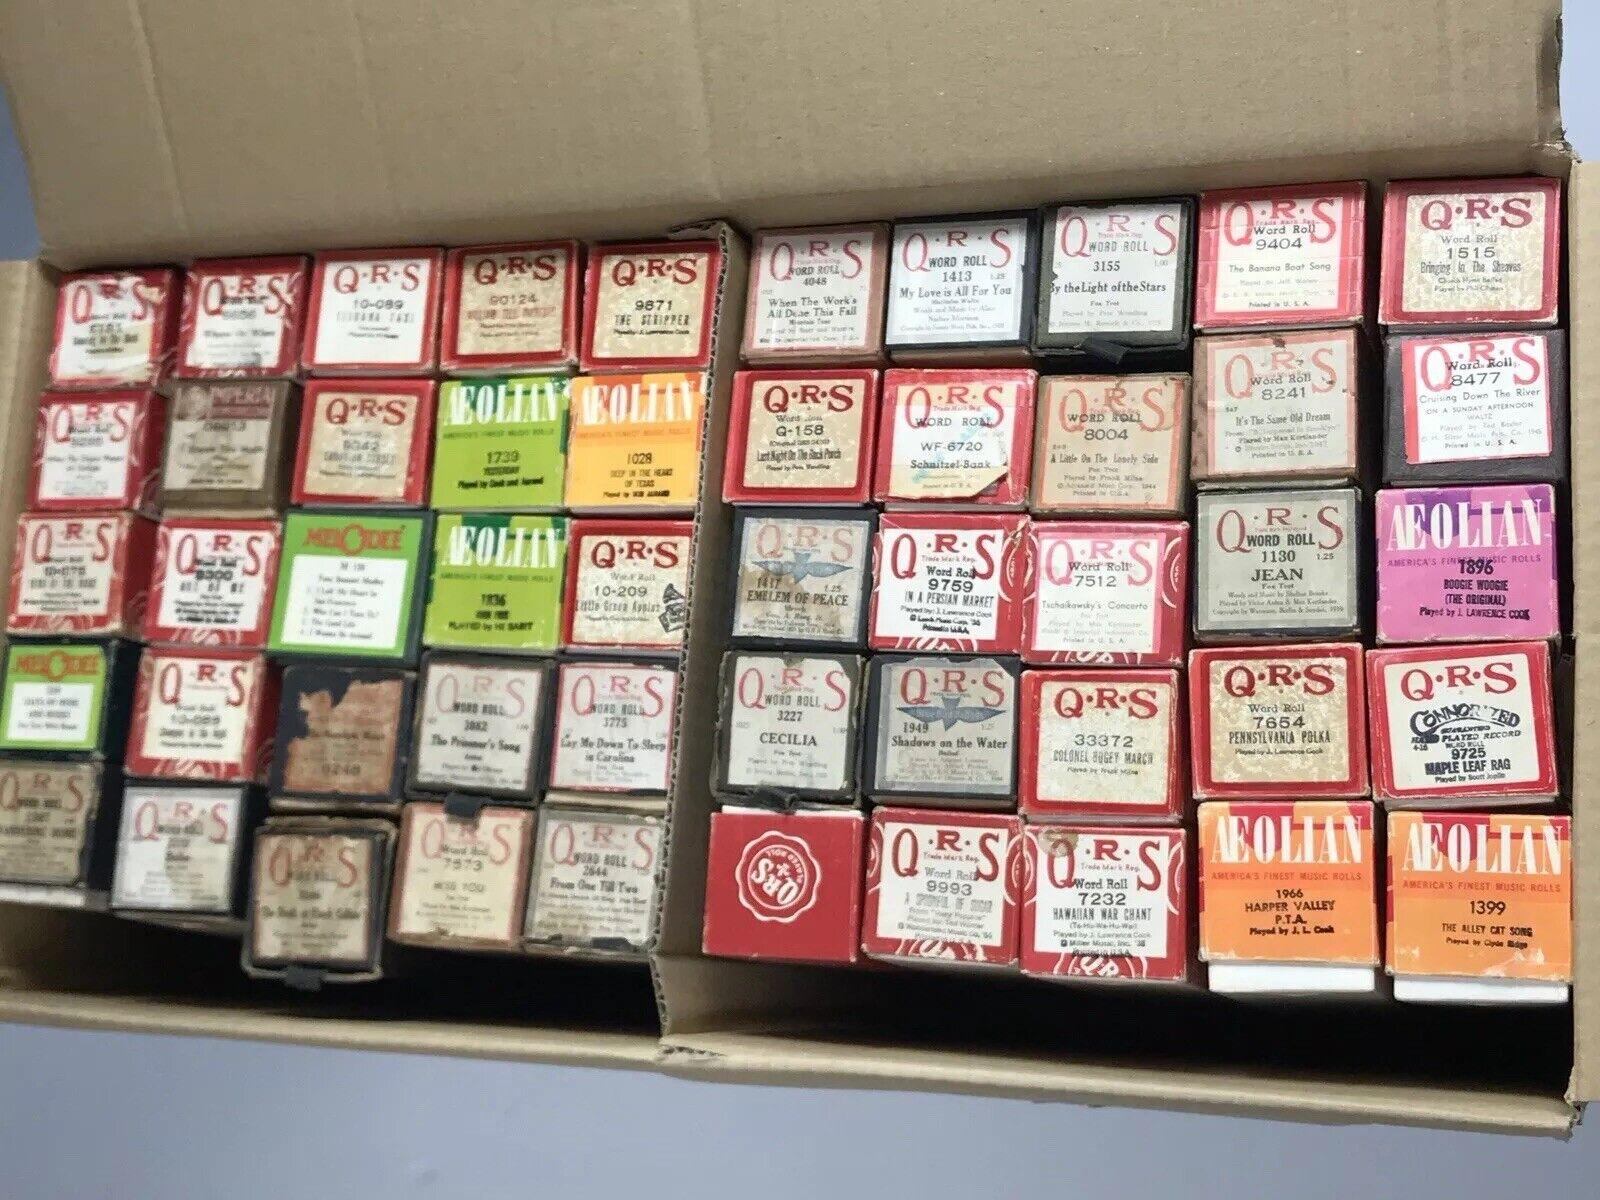 LOT OF 50 QRS AEOLIAN braun rot BOX PLAYER PIANO ROLLS